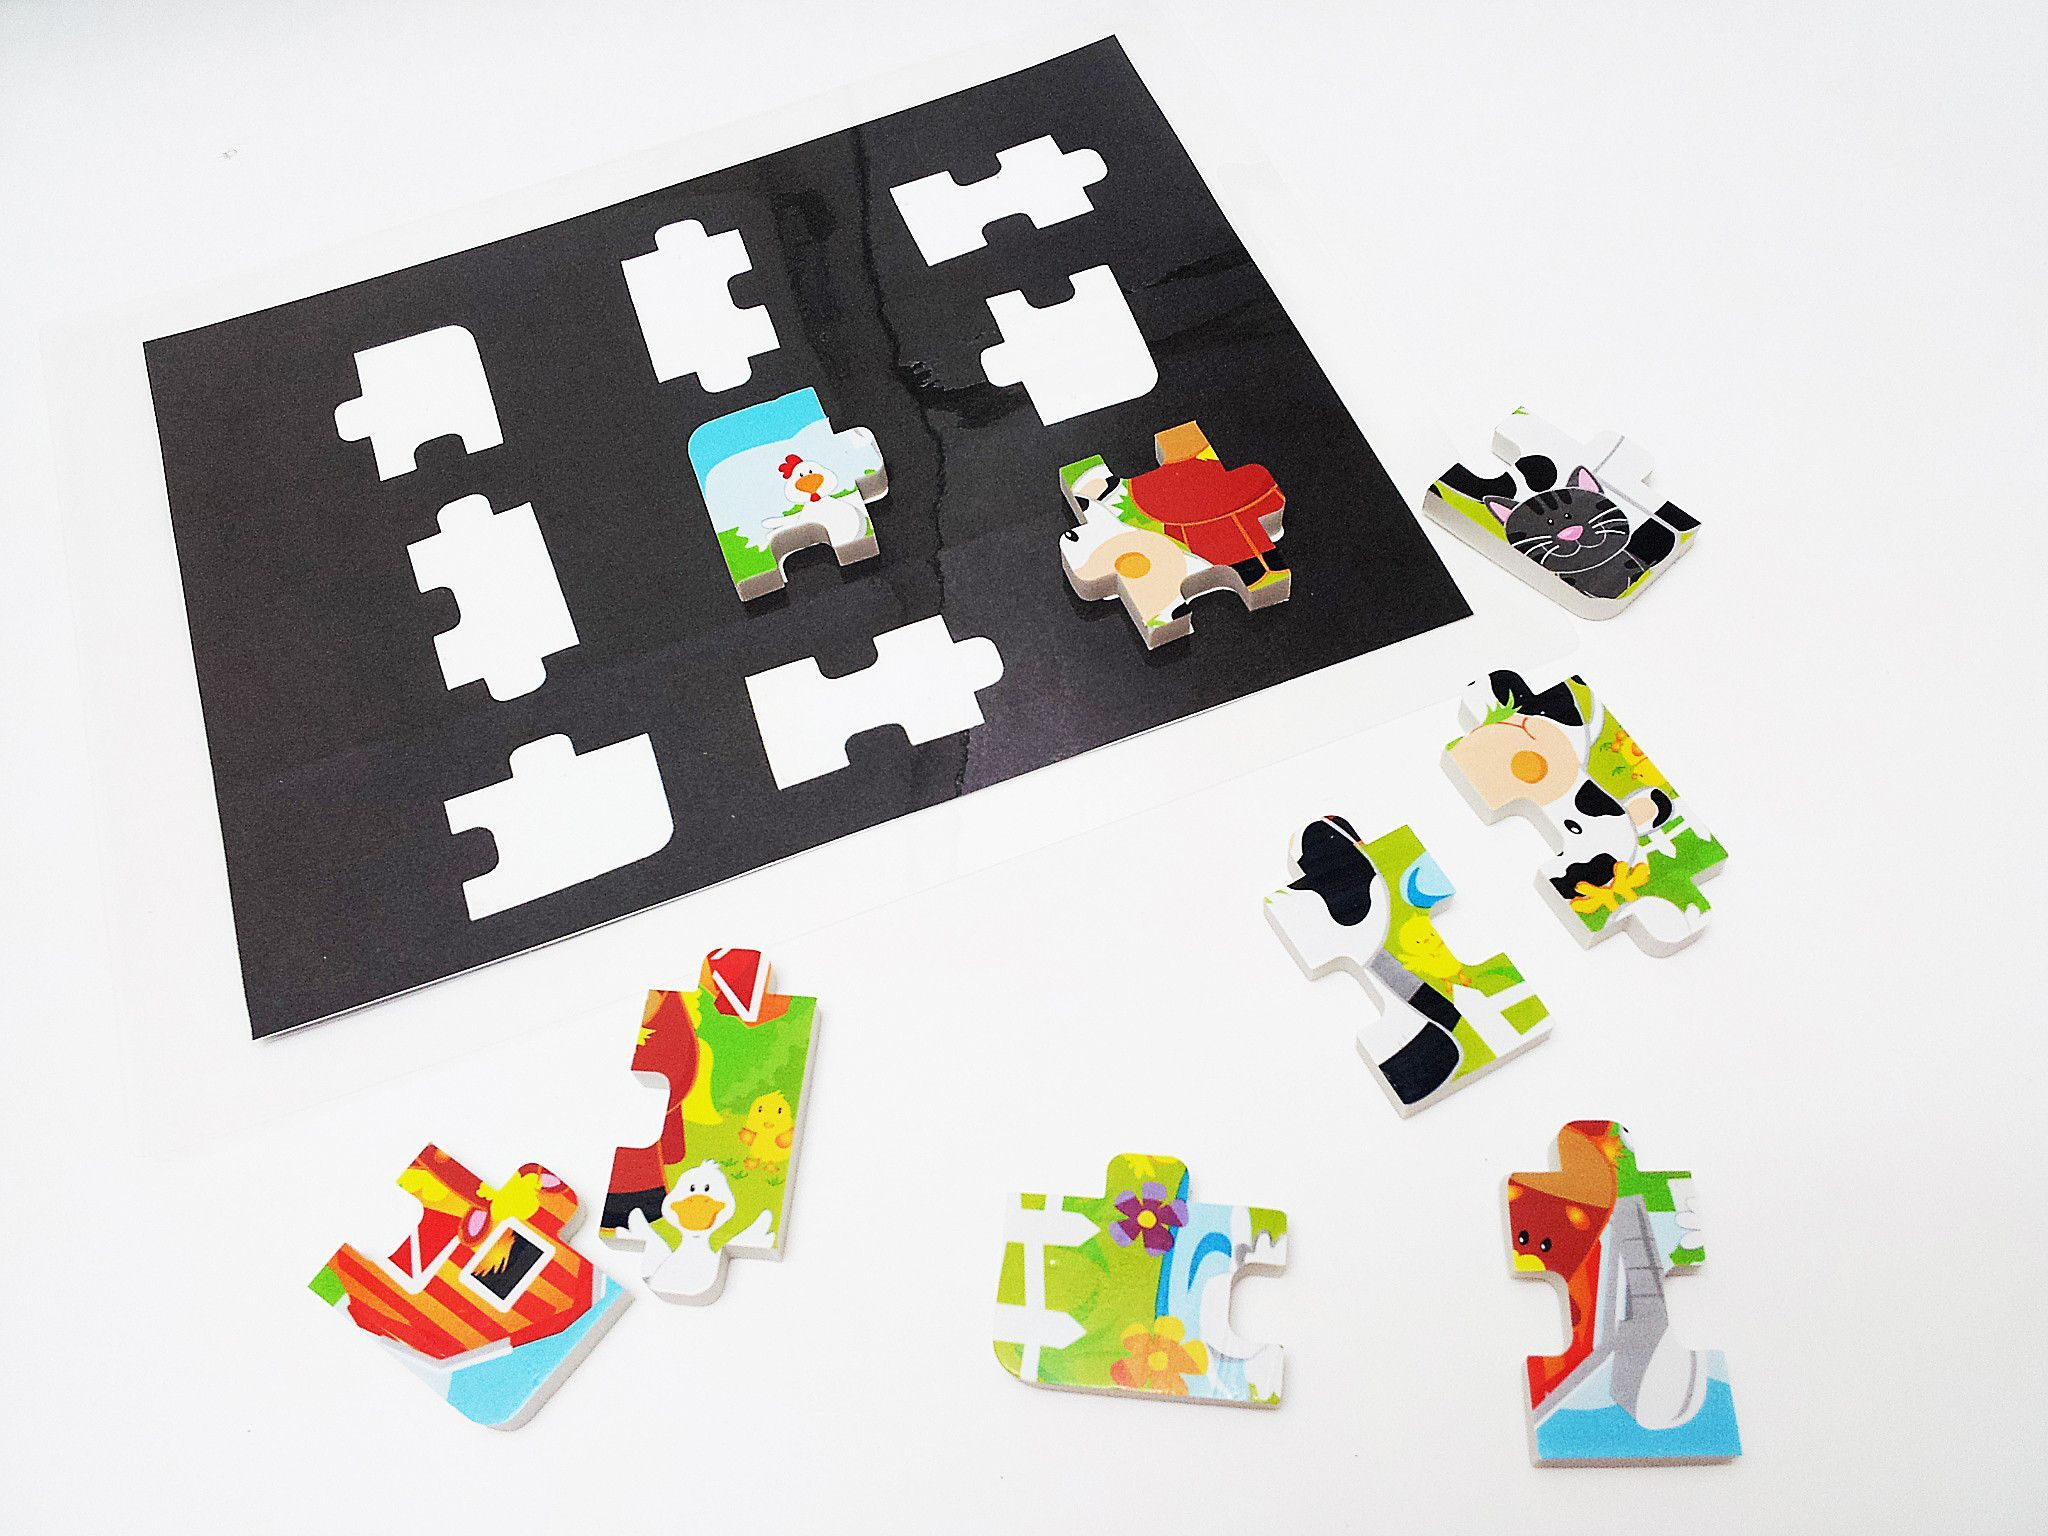 Silhouette Matching Eraser Farm Puzzle Activity